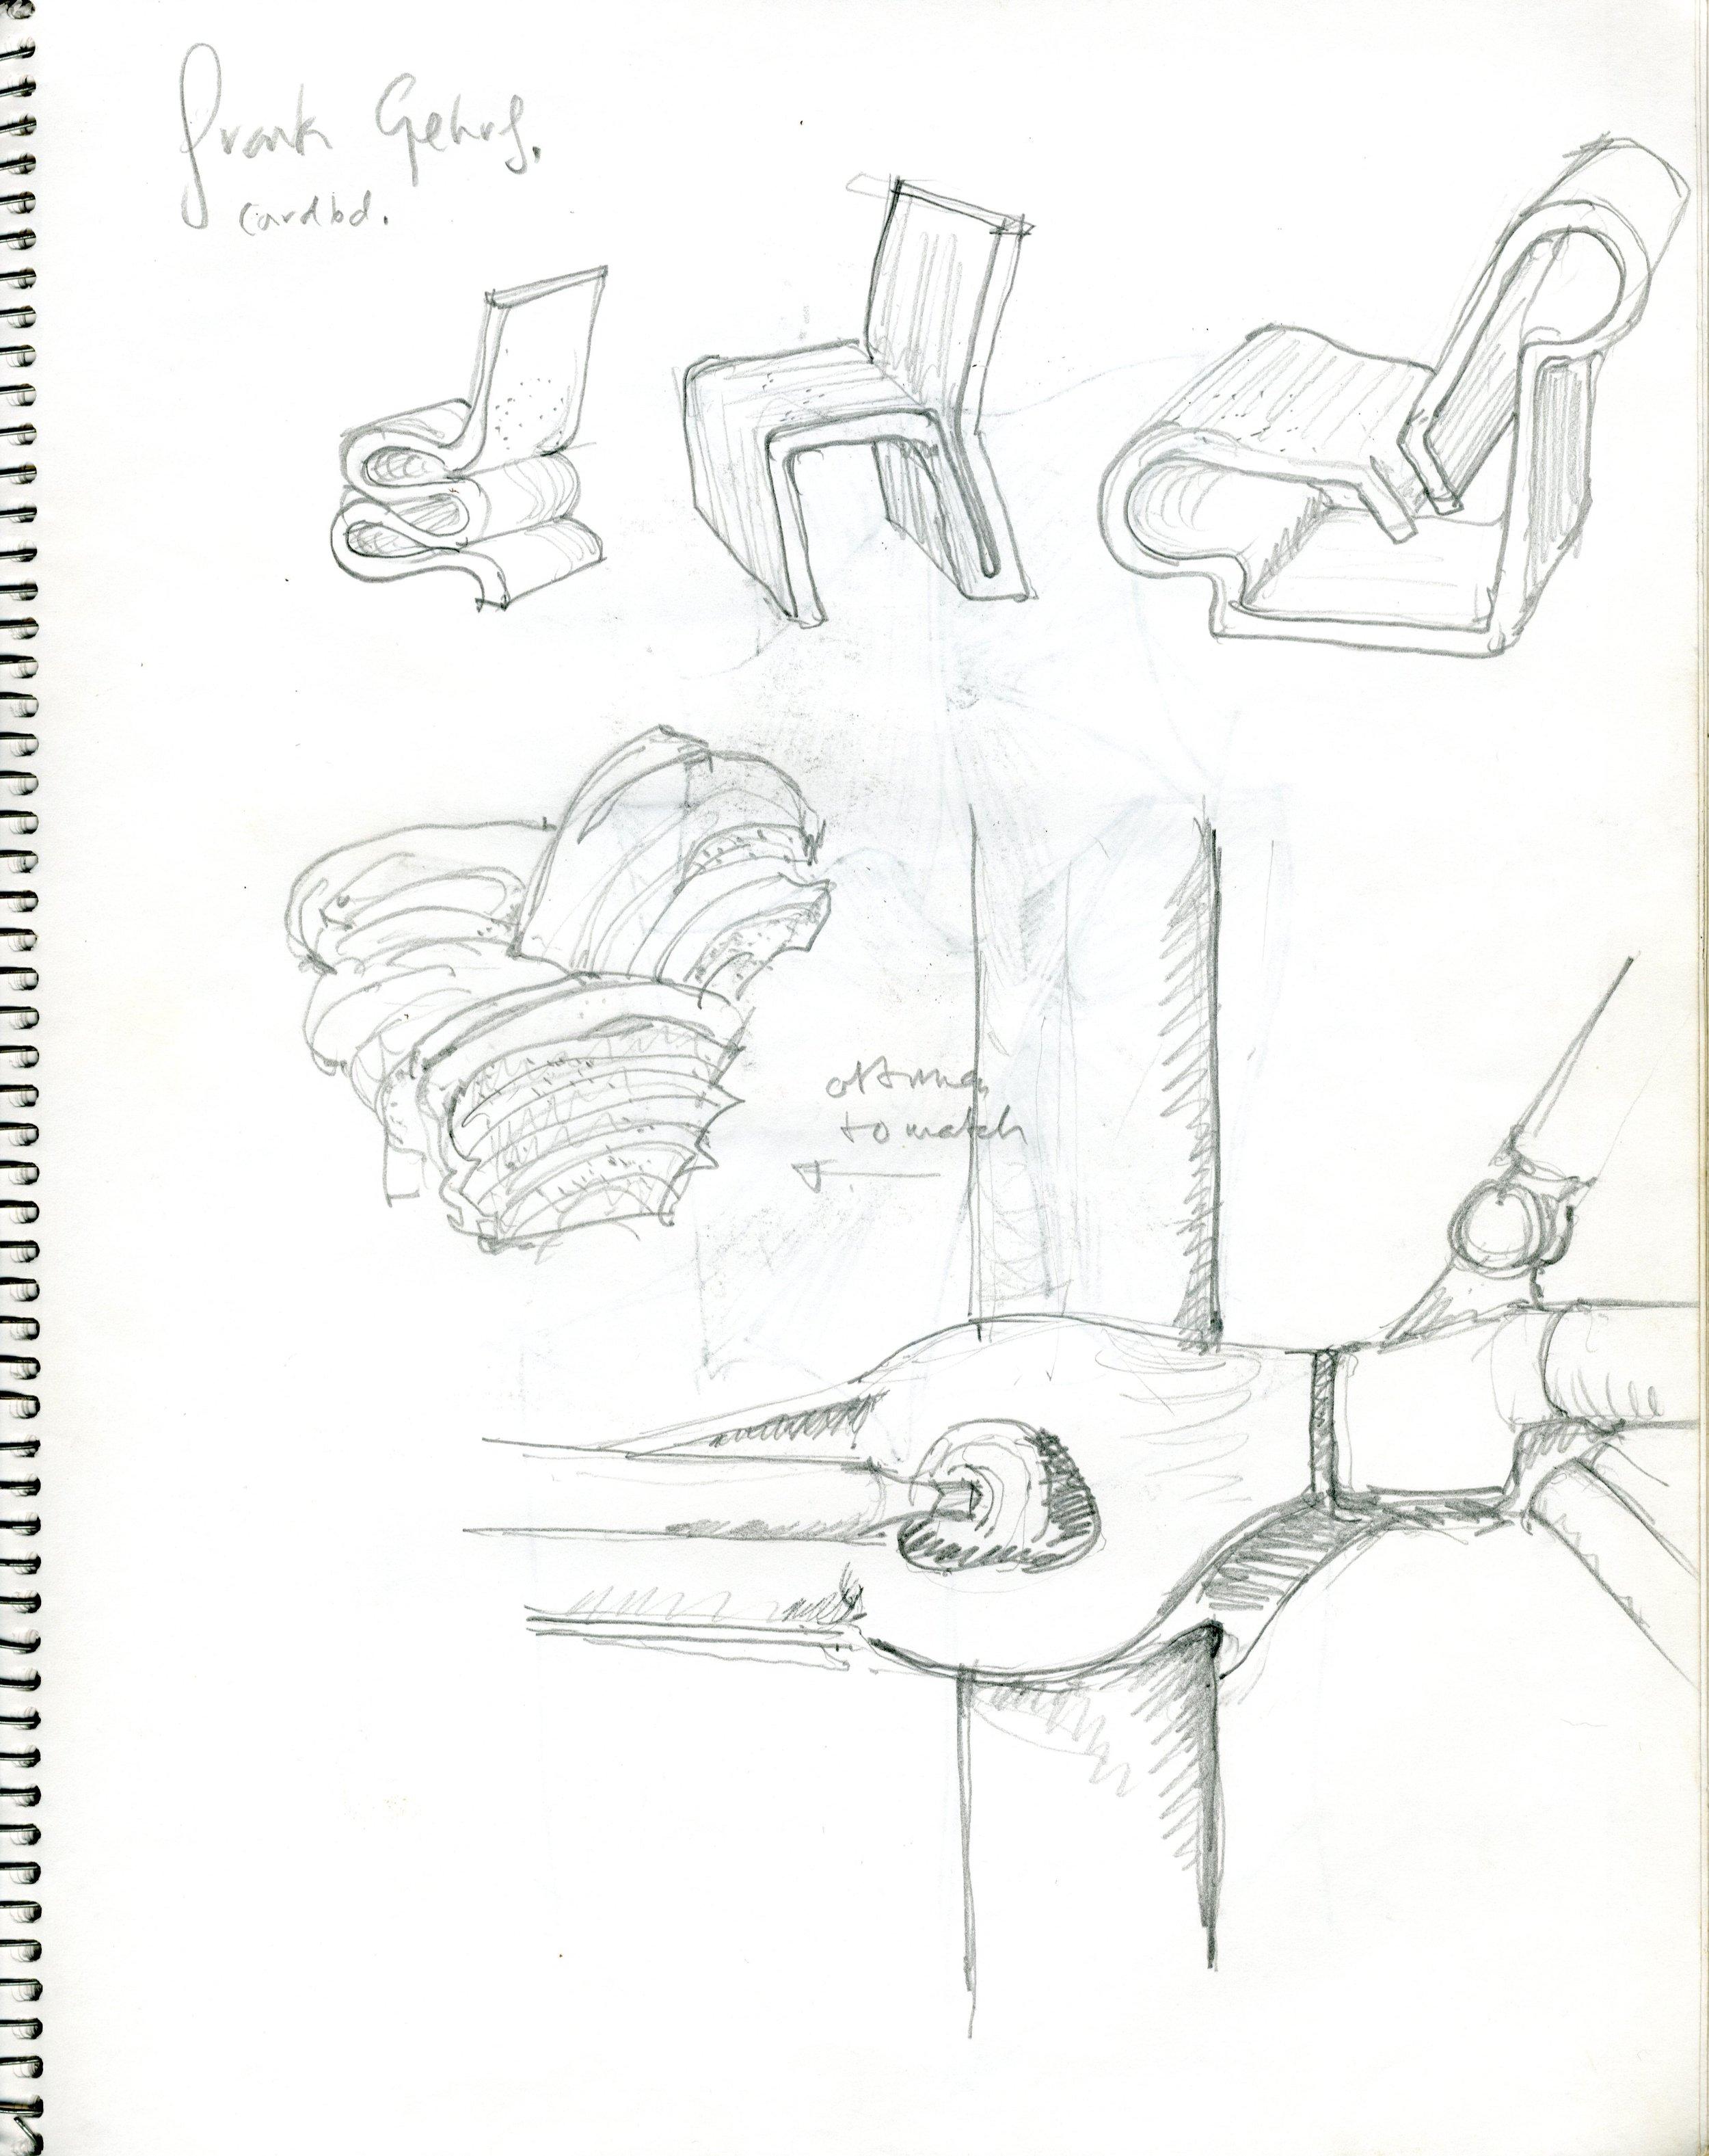 pompidou2.img033.jpg